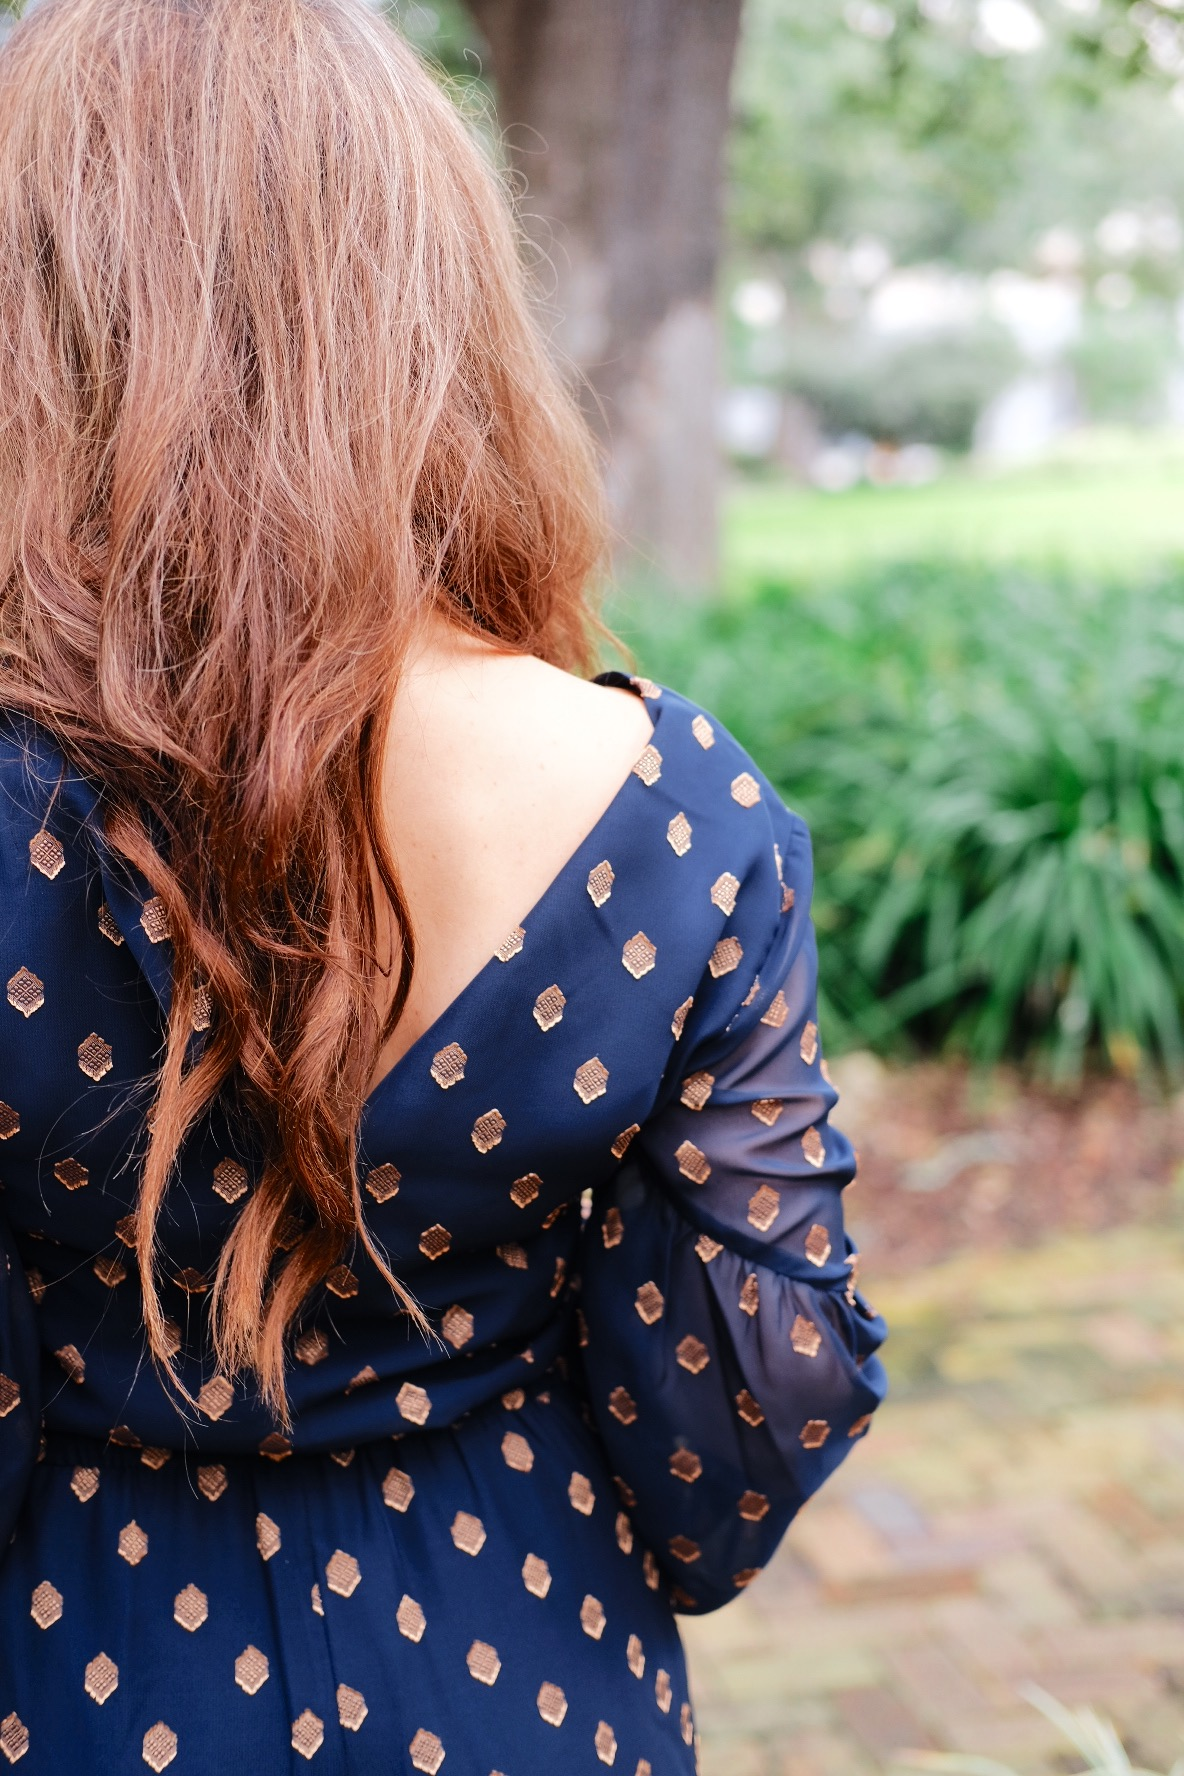 Brenna Lauren back of blue jumper in Savannah, Georgia